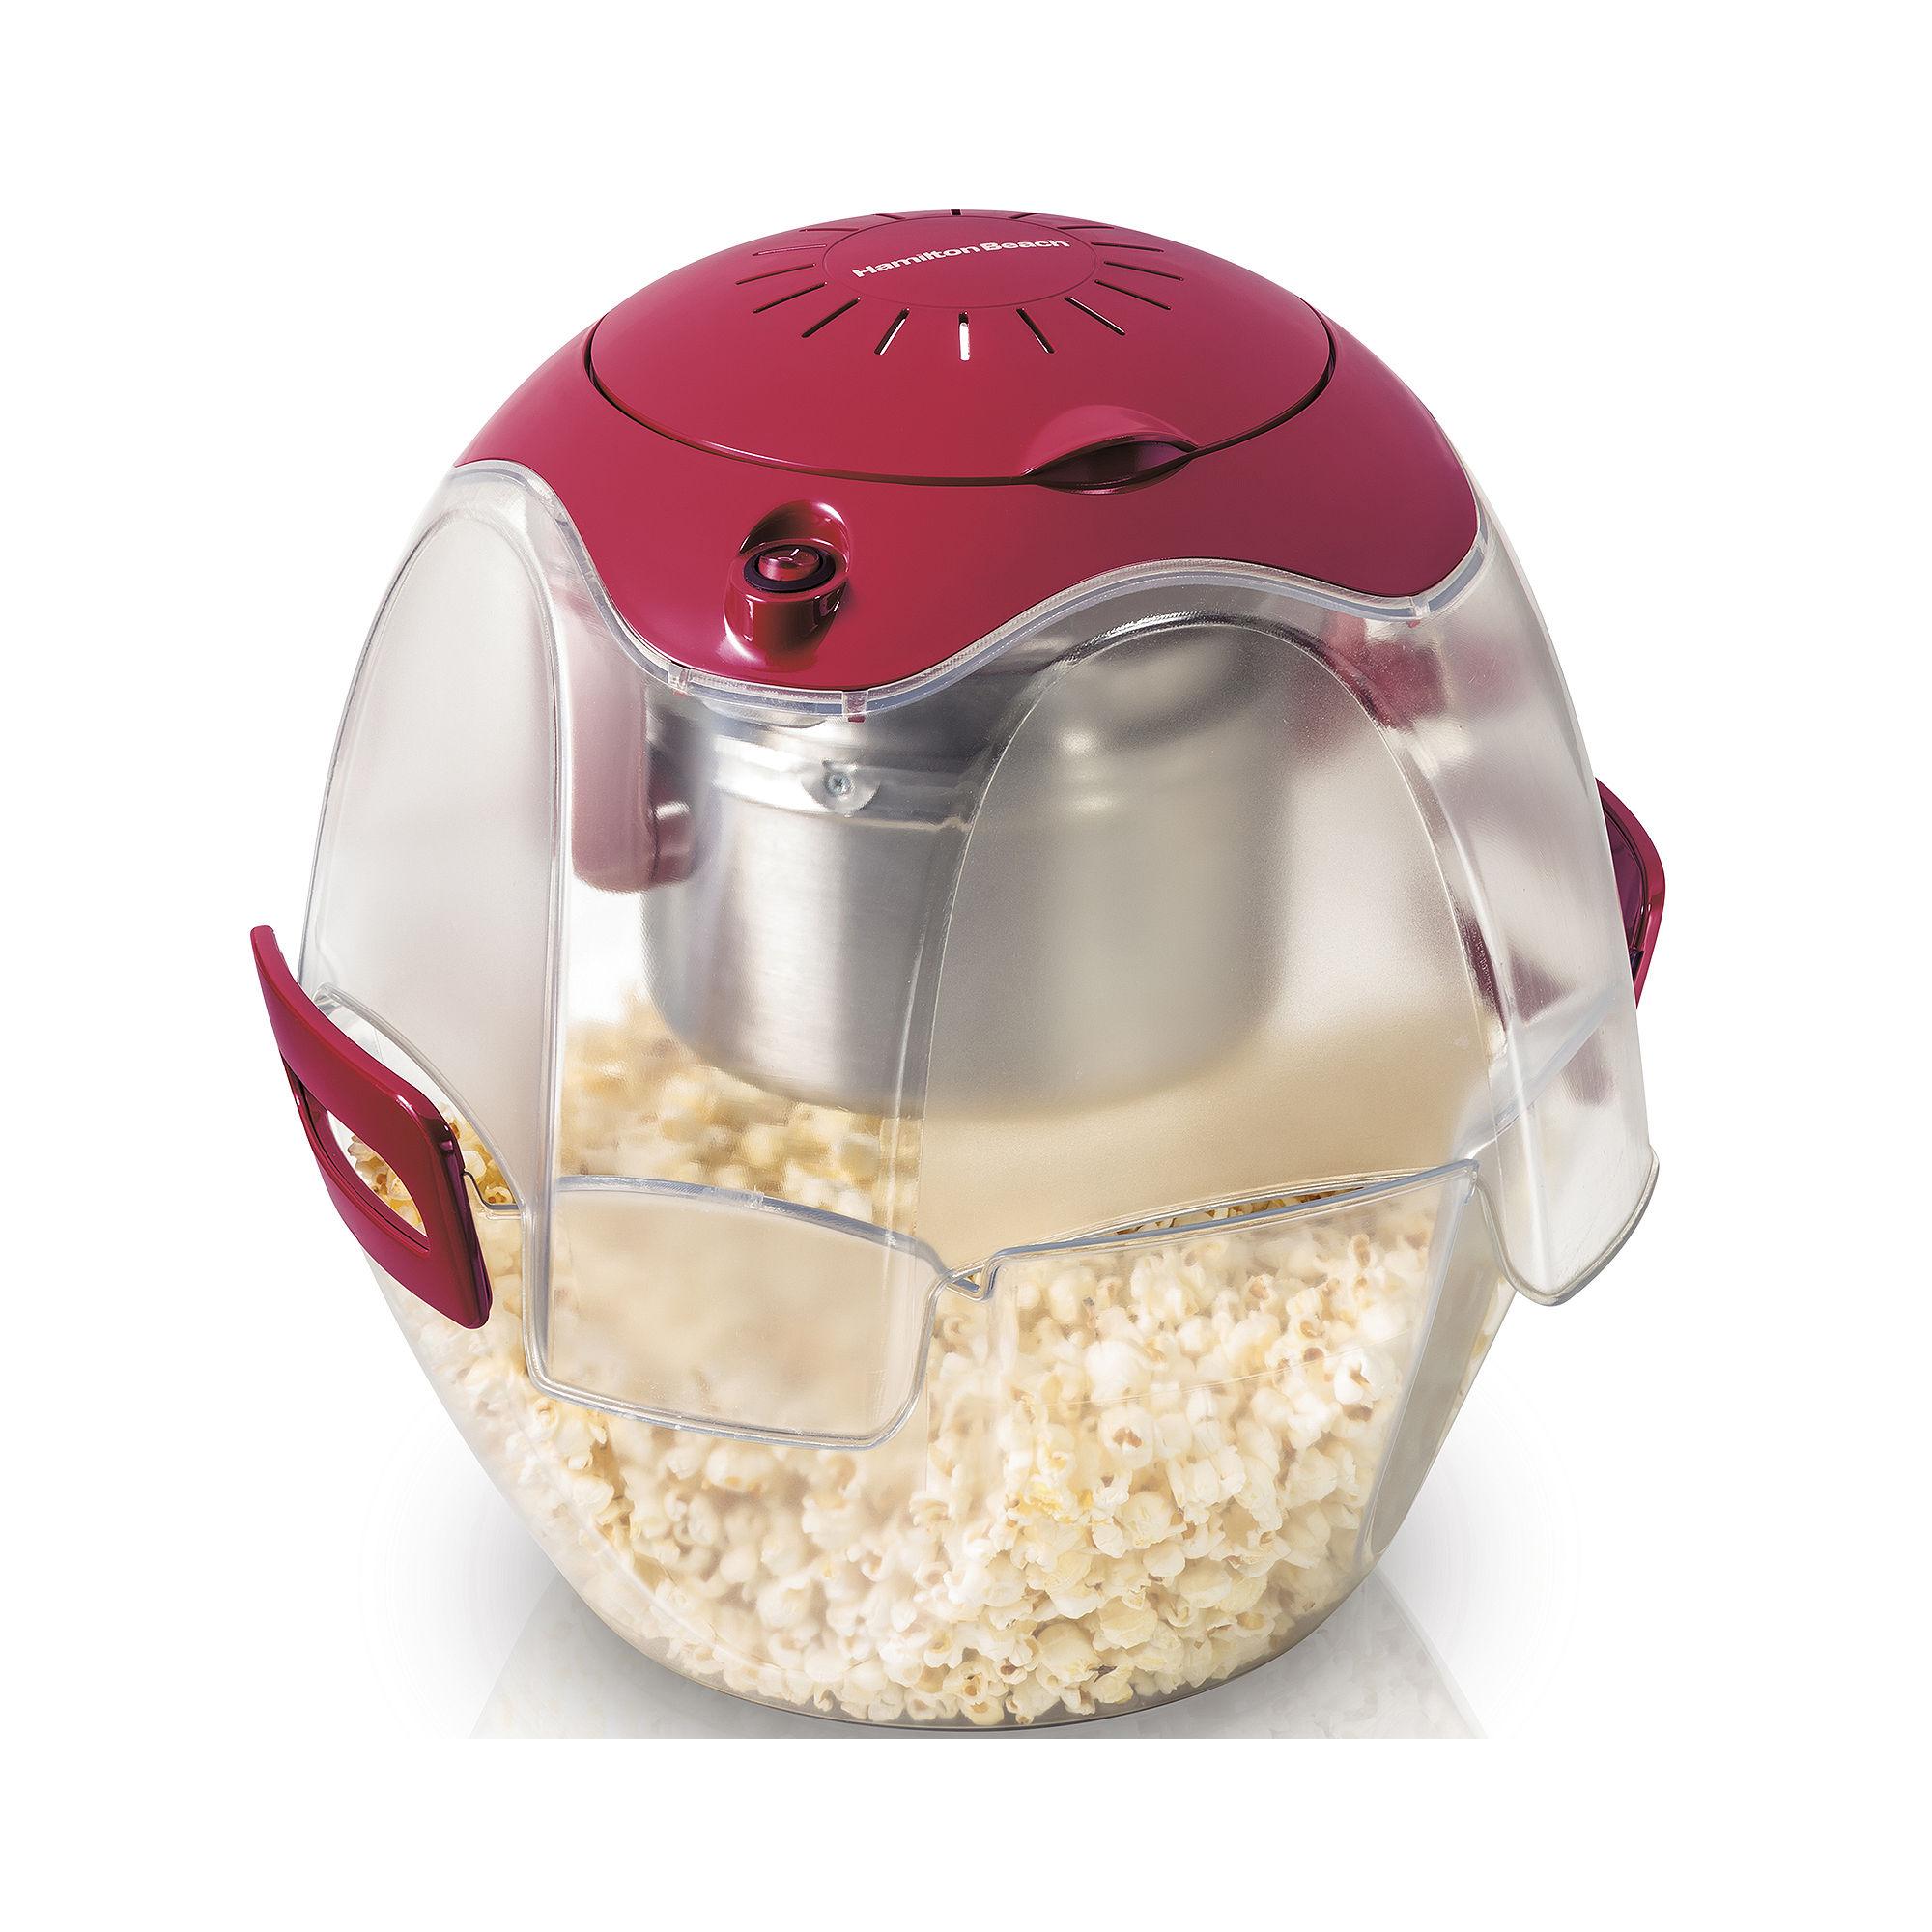 "Hamilton Beach Party Popper"" Popcorn Popper"